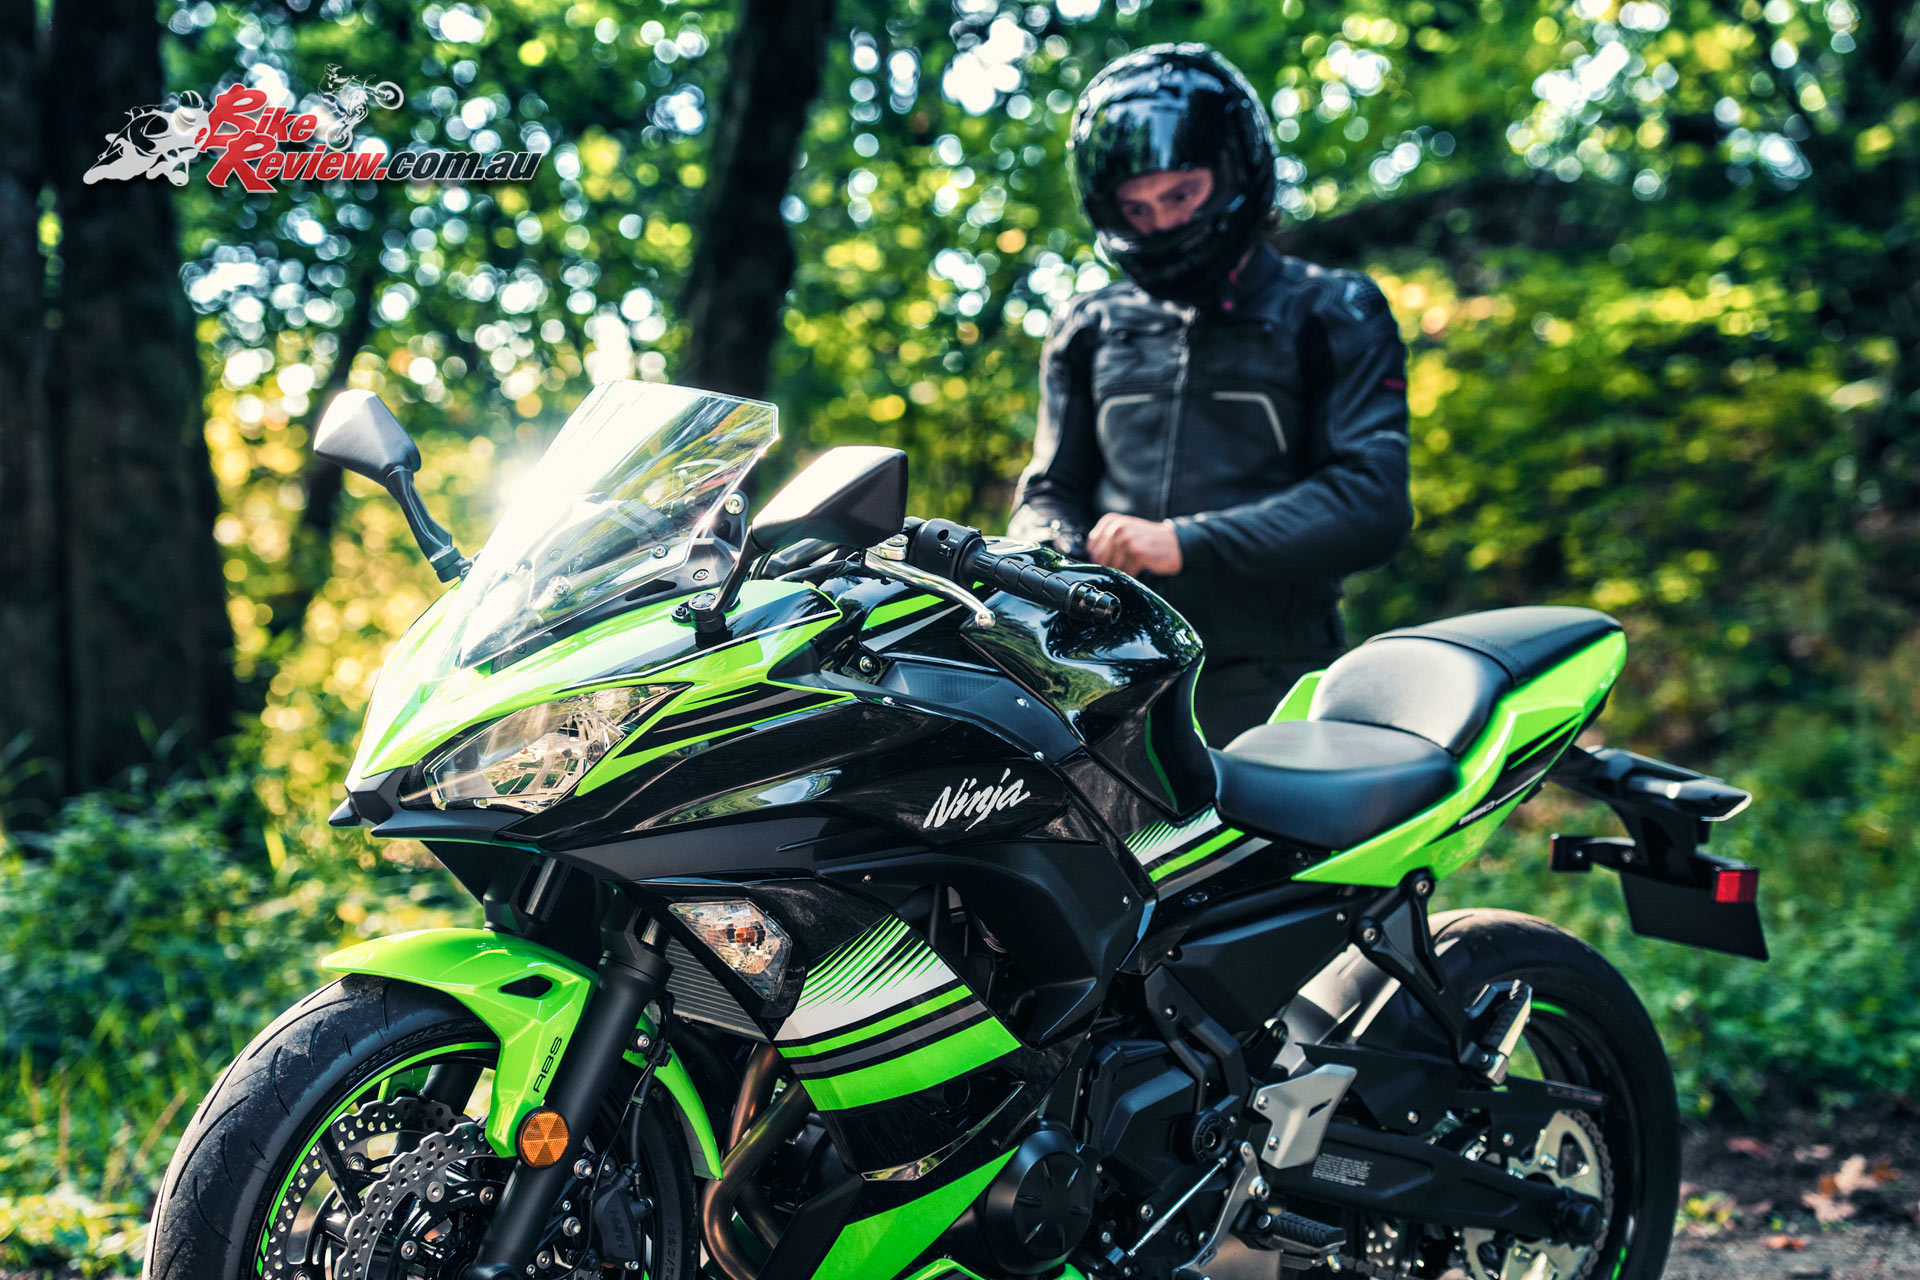 Kawasaki S 2017 Ninja 650 Amp 650l Available Now Bike Review